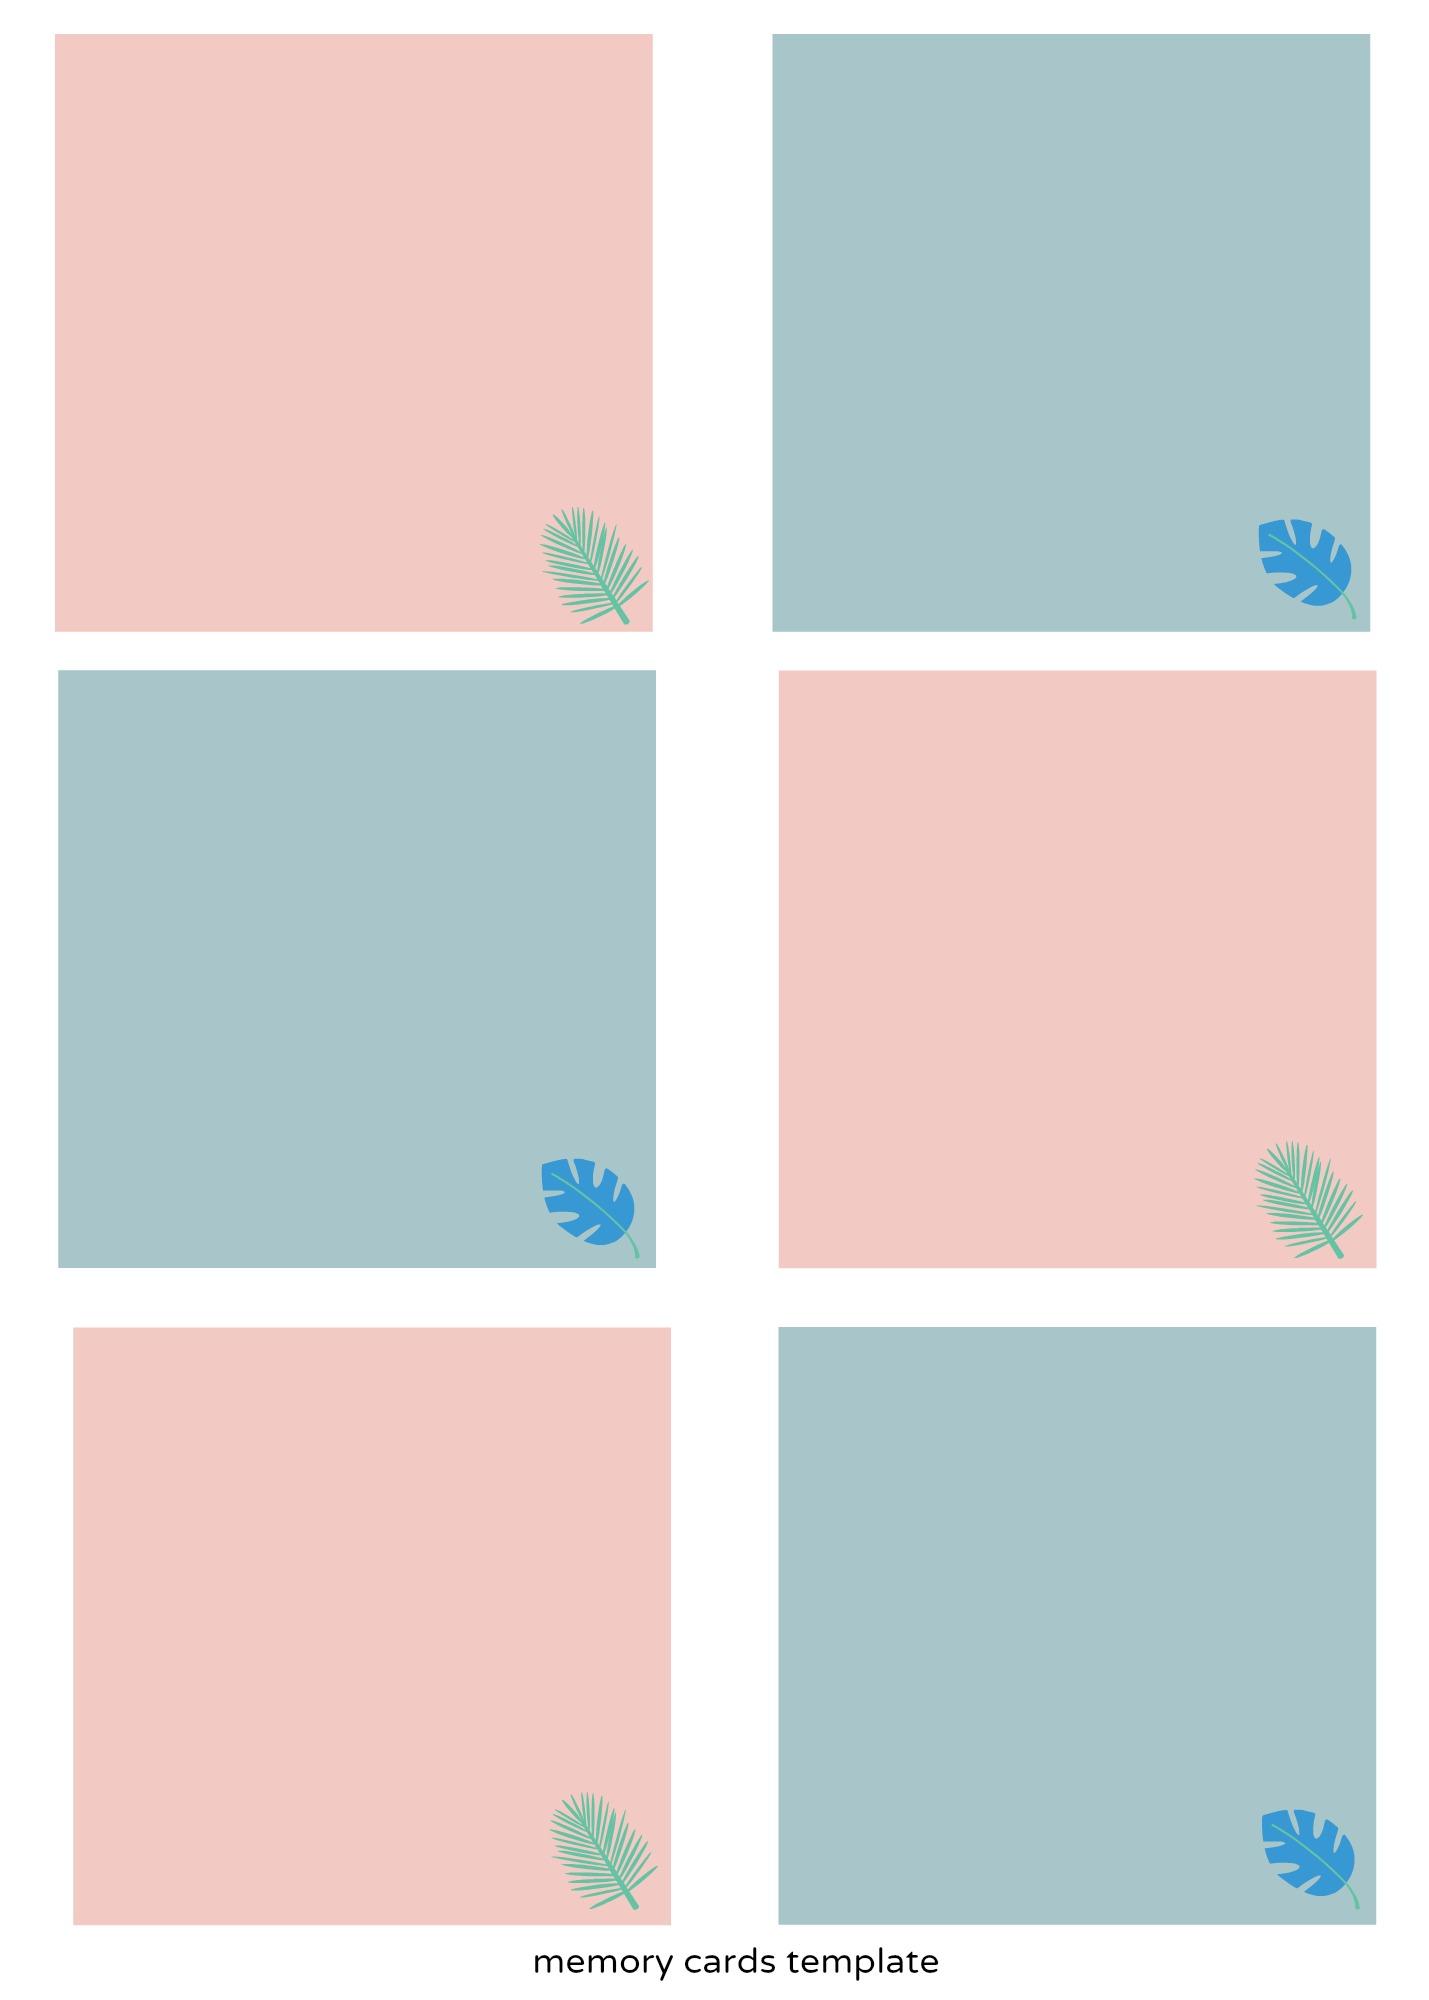 memory card template.jpg